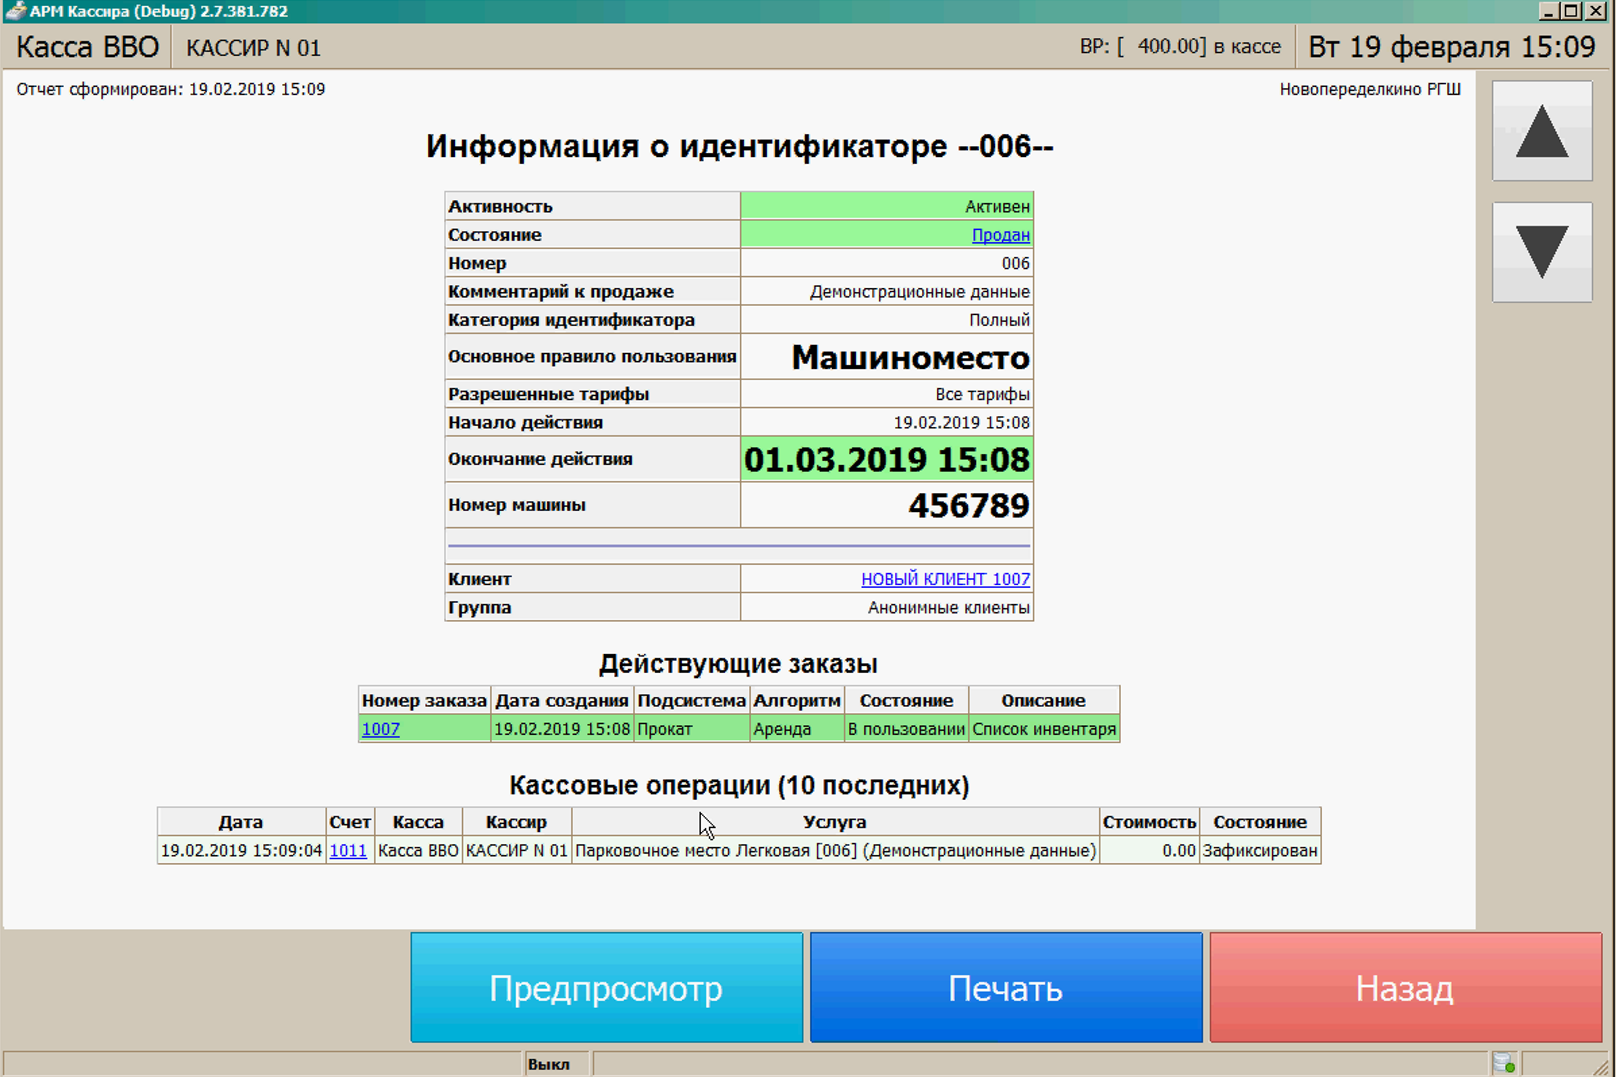 2316 Прокат Аренда машиномест